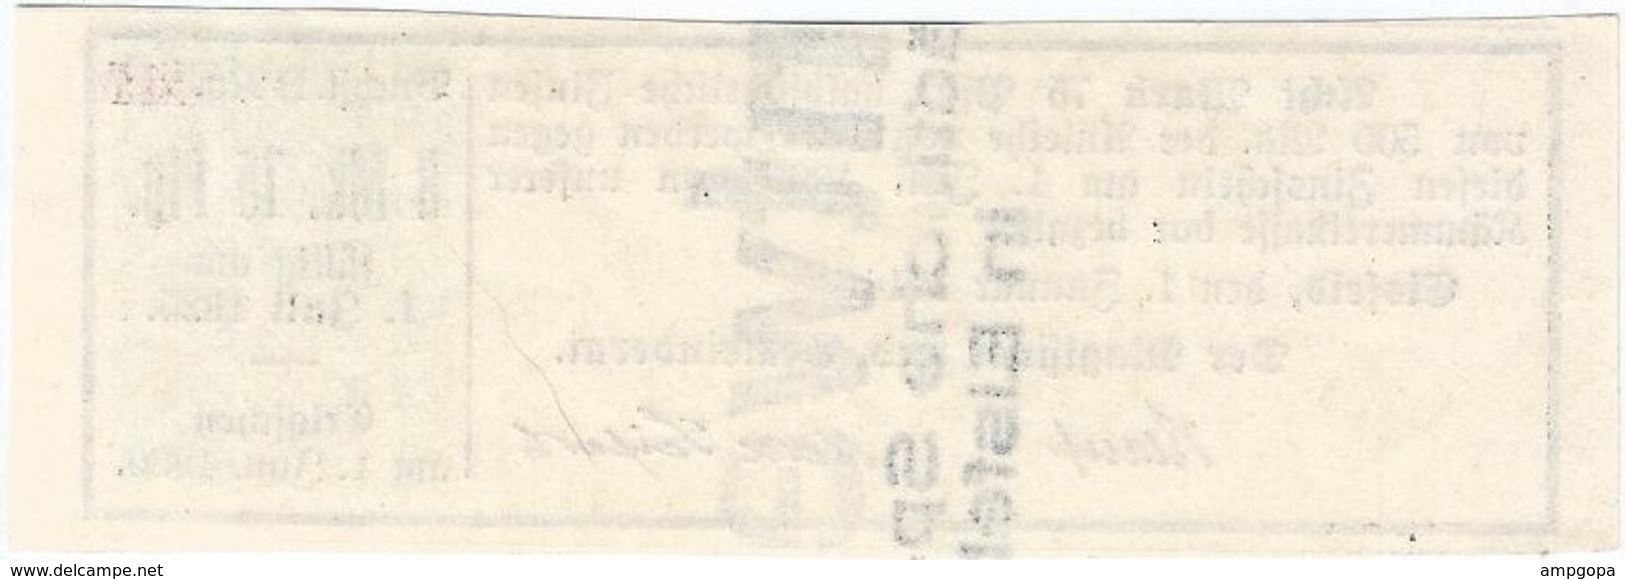 Alemania (BONOS) - Germany 8.75 Mark 1-1-1914 Esifeld Ref 20 - [ 2] 1871-1918 : German Empire